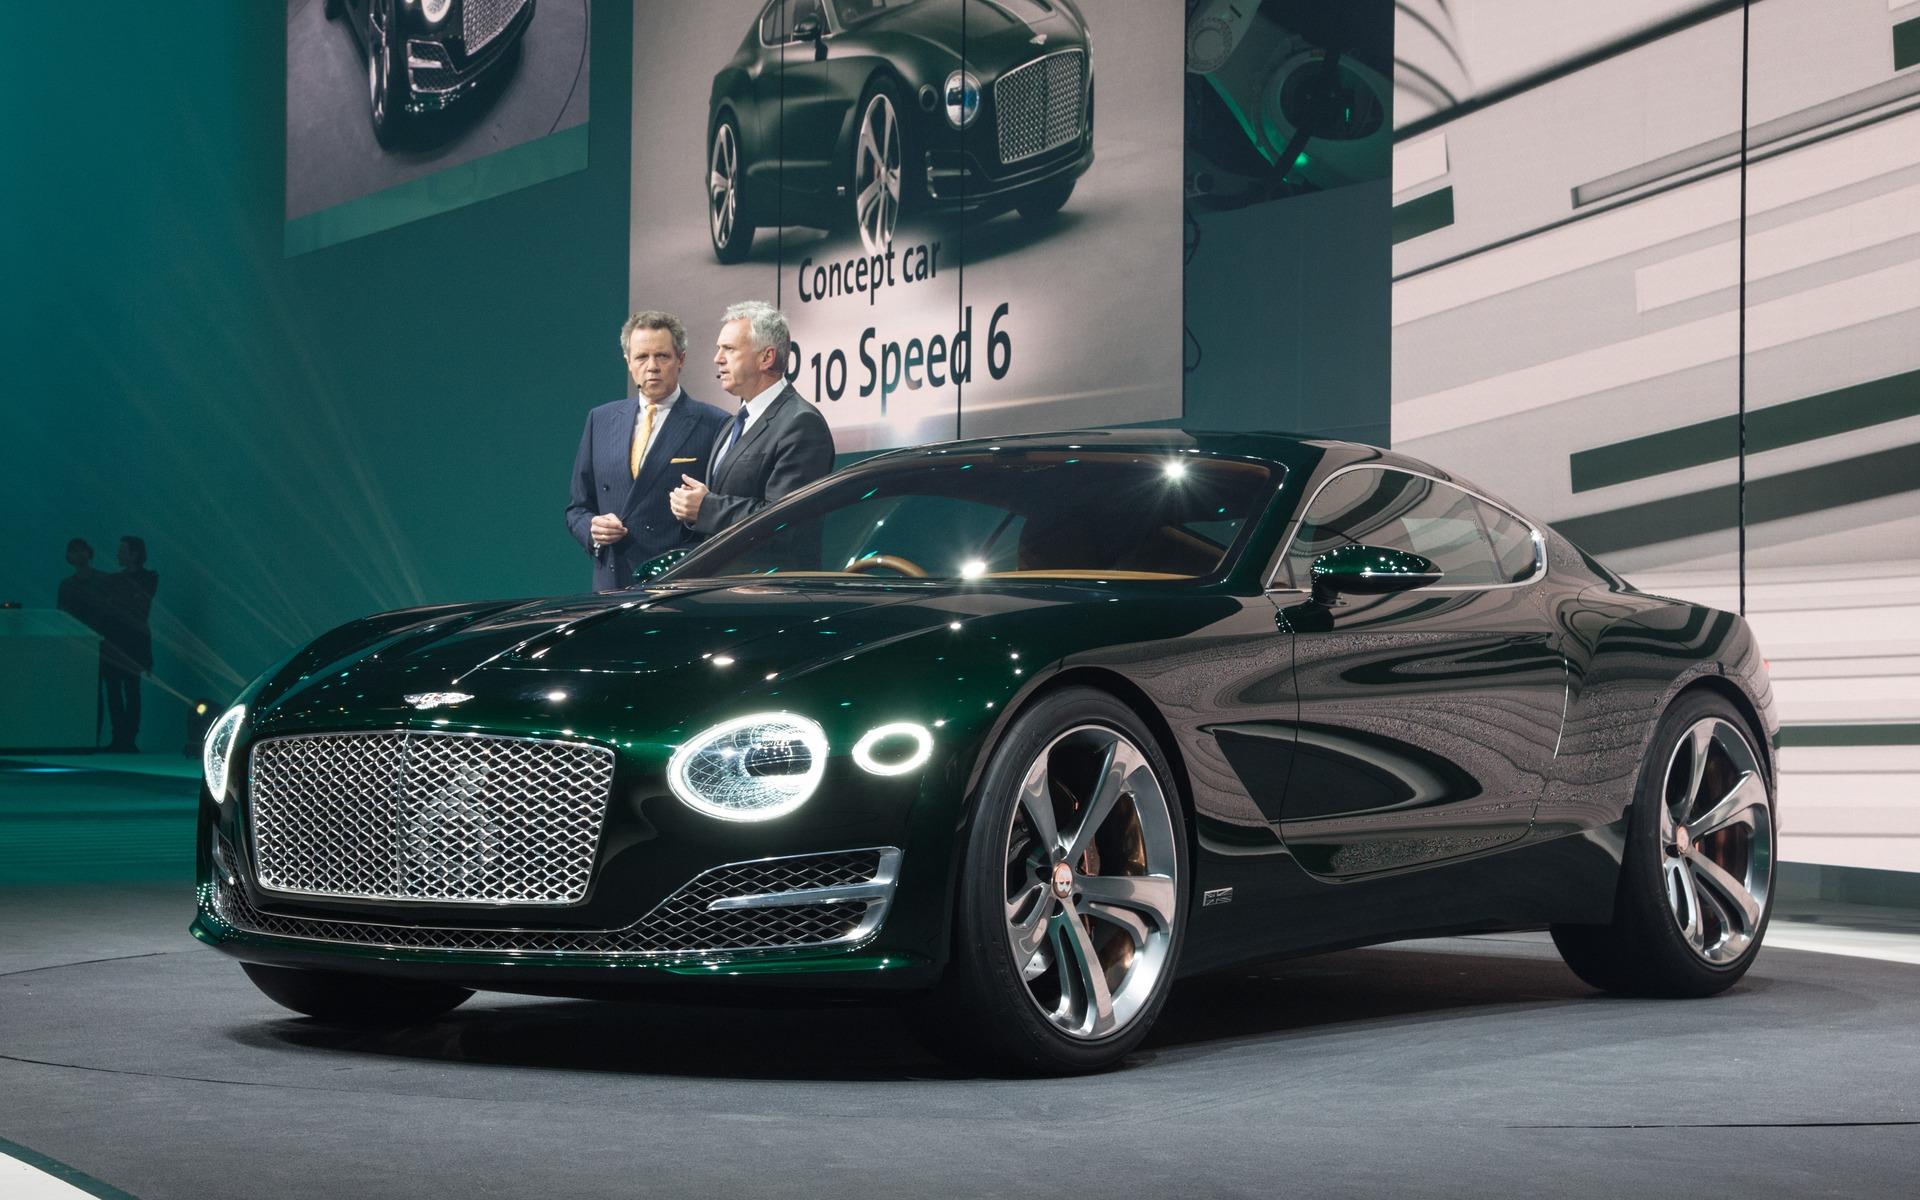 bentley exp 10 speed 6 concept vive le futur guide auto. Black Bedroom Furniture Sets. Home Design Ideas